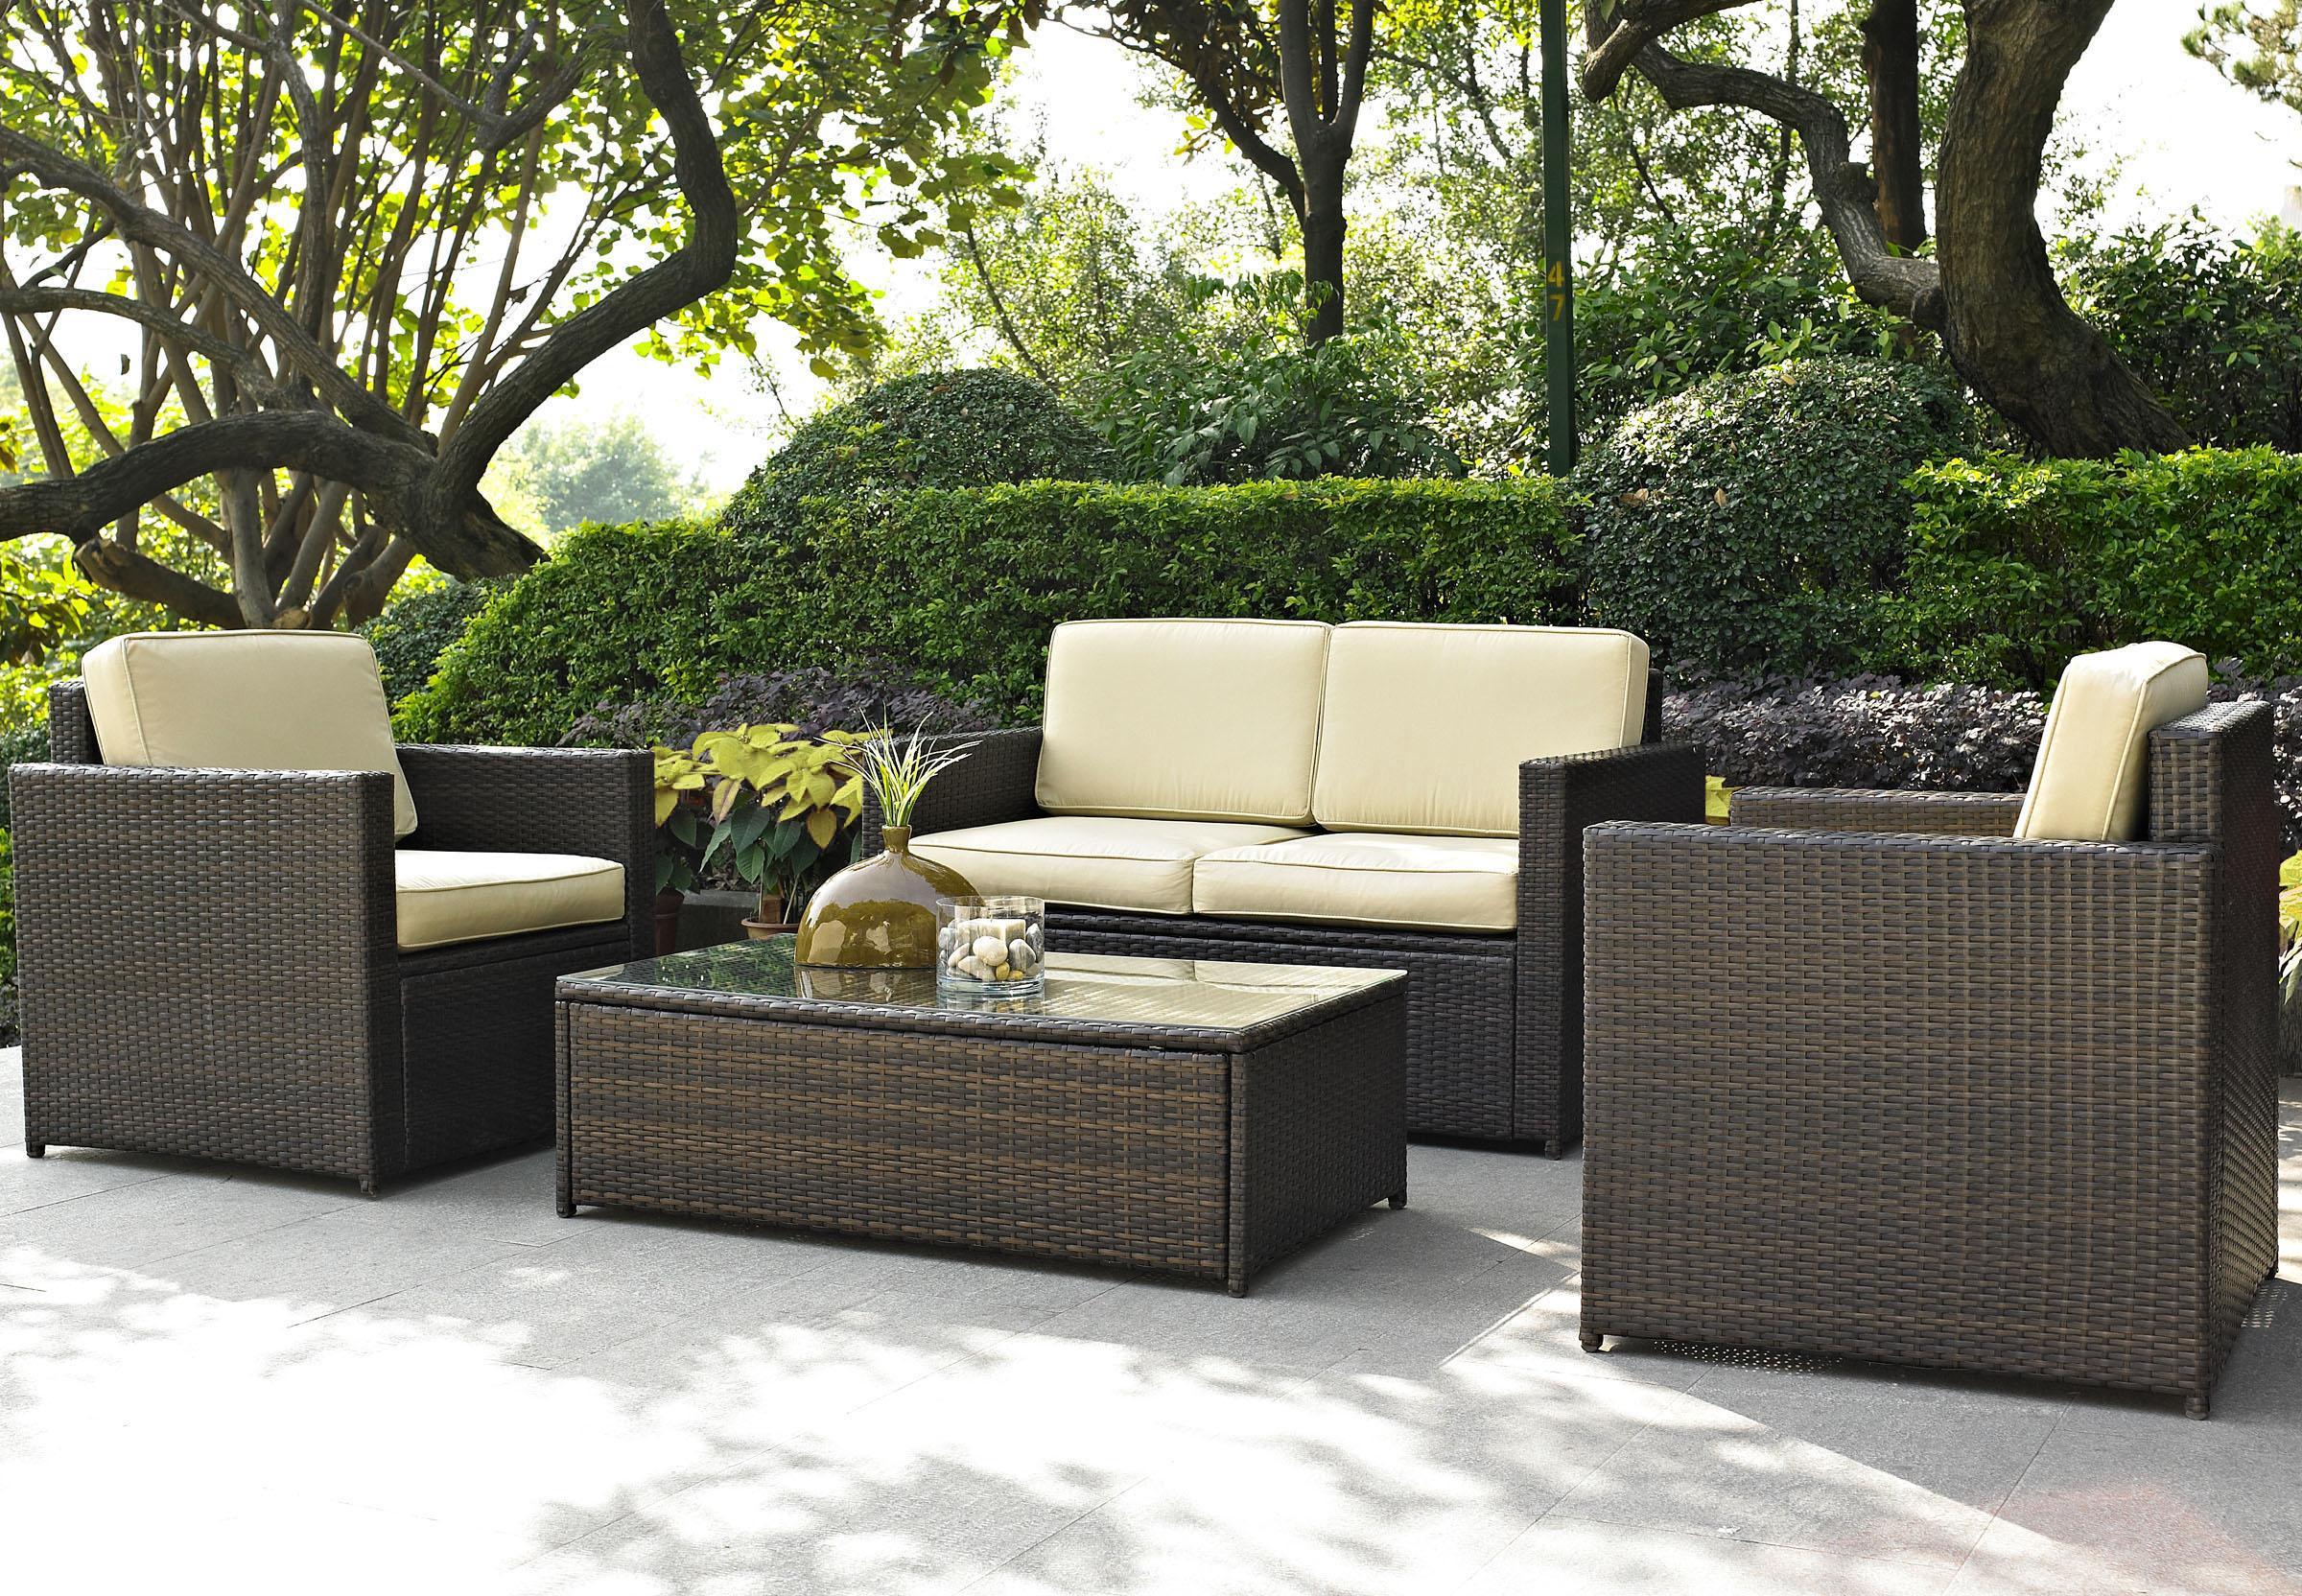 outdoor furniture ideas